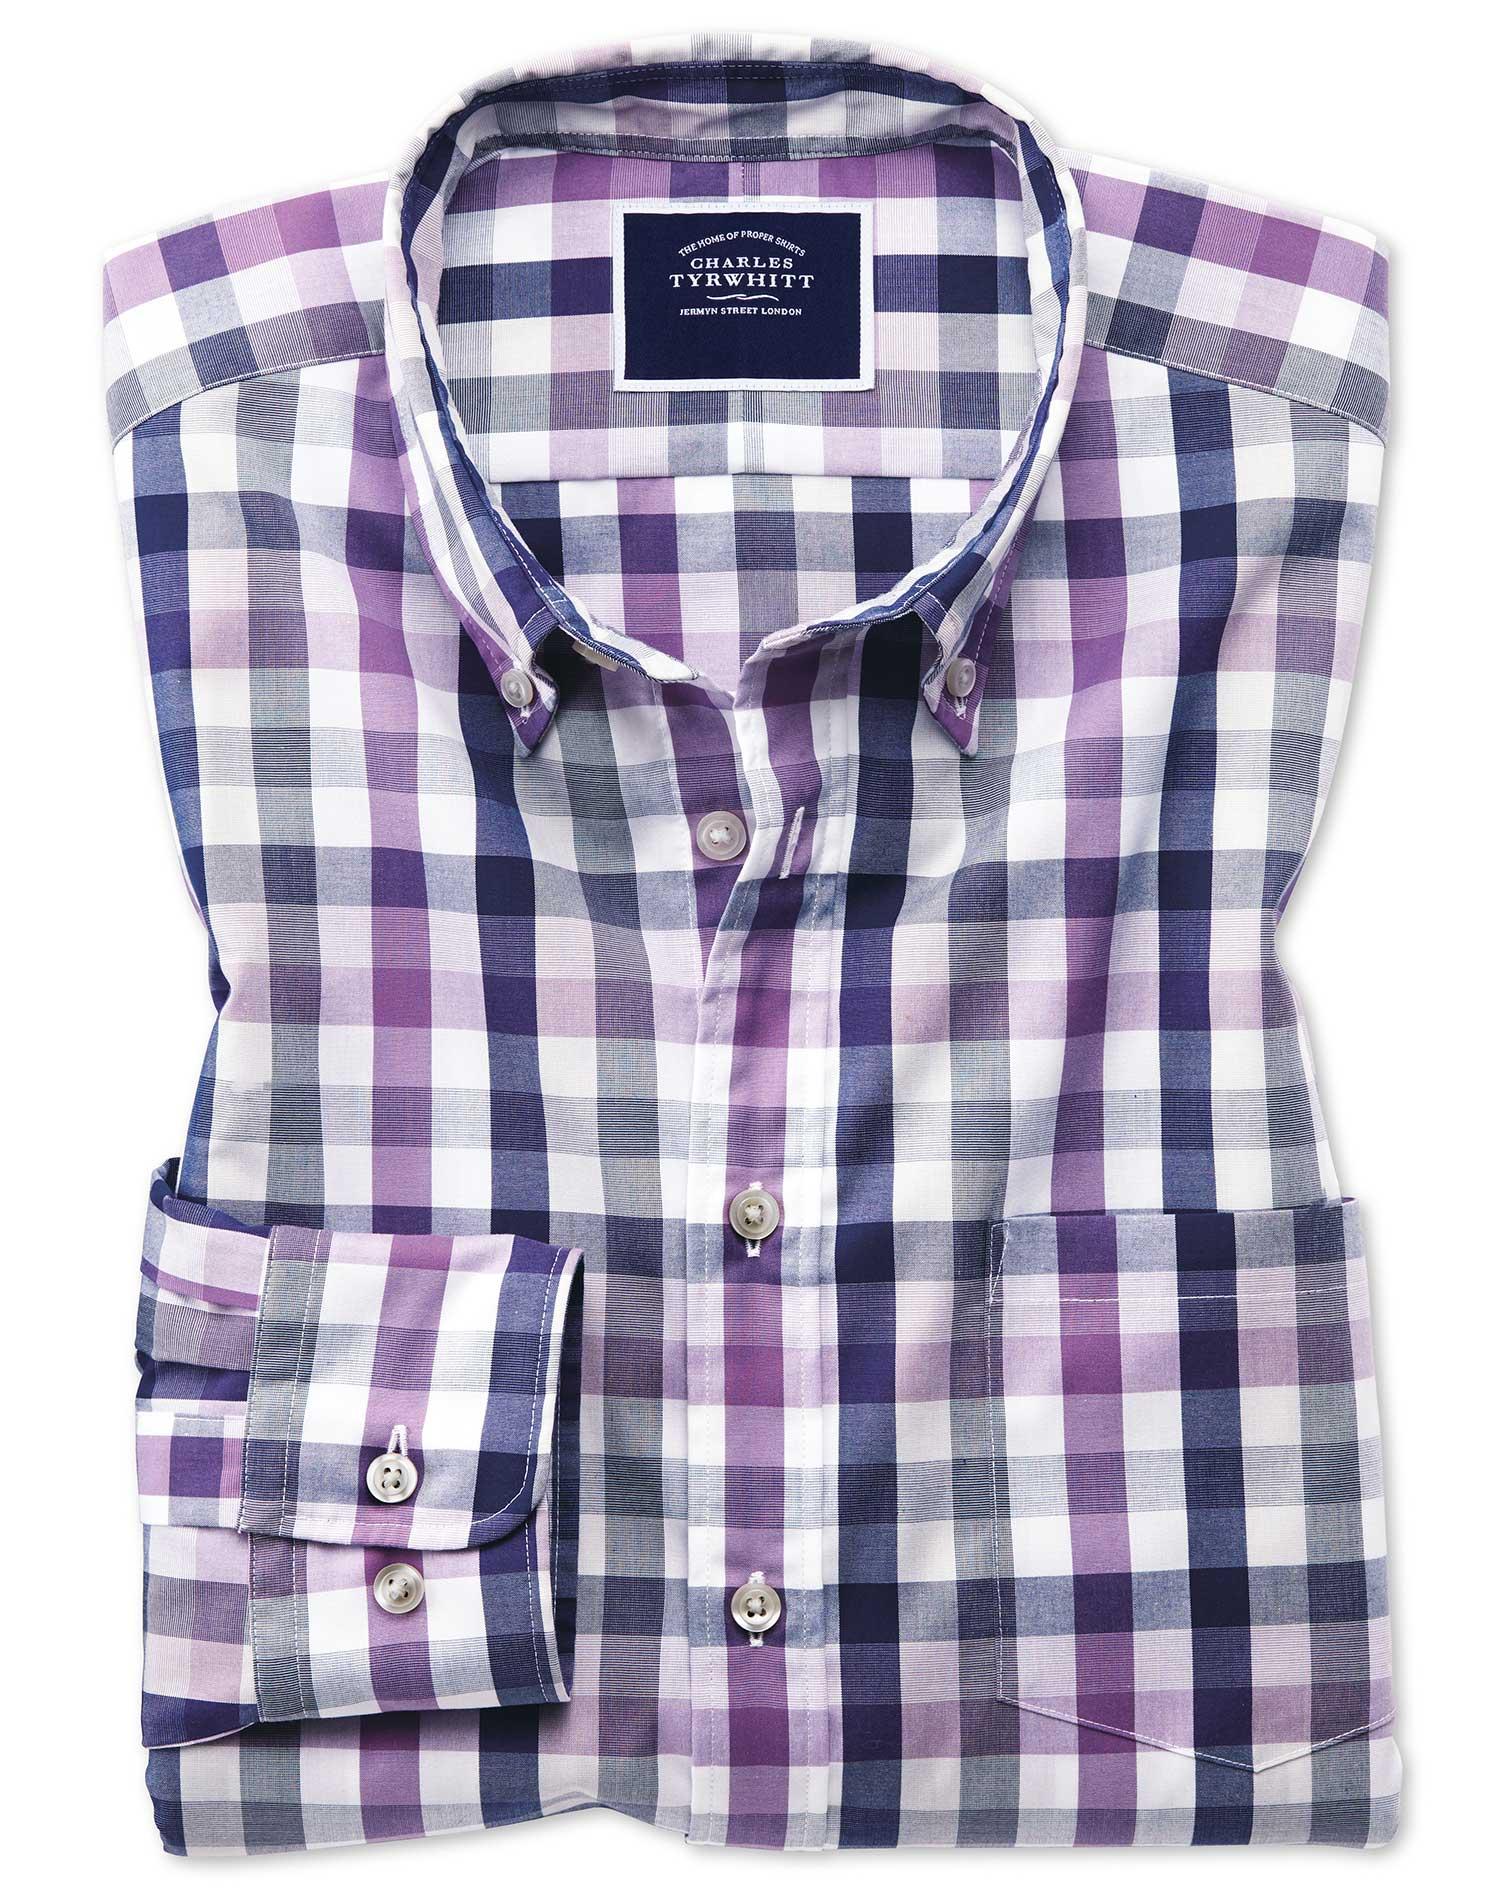 Slim Fit Purple Multi Check Soft Washed Non-Iron Tyrwhitt Cool Cotton Shirt Single Cuff Size XXL by